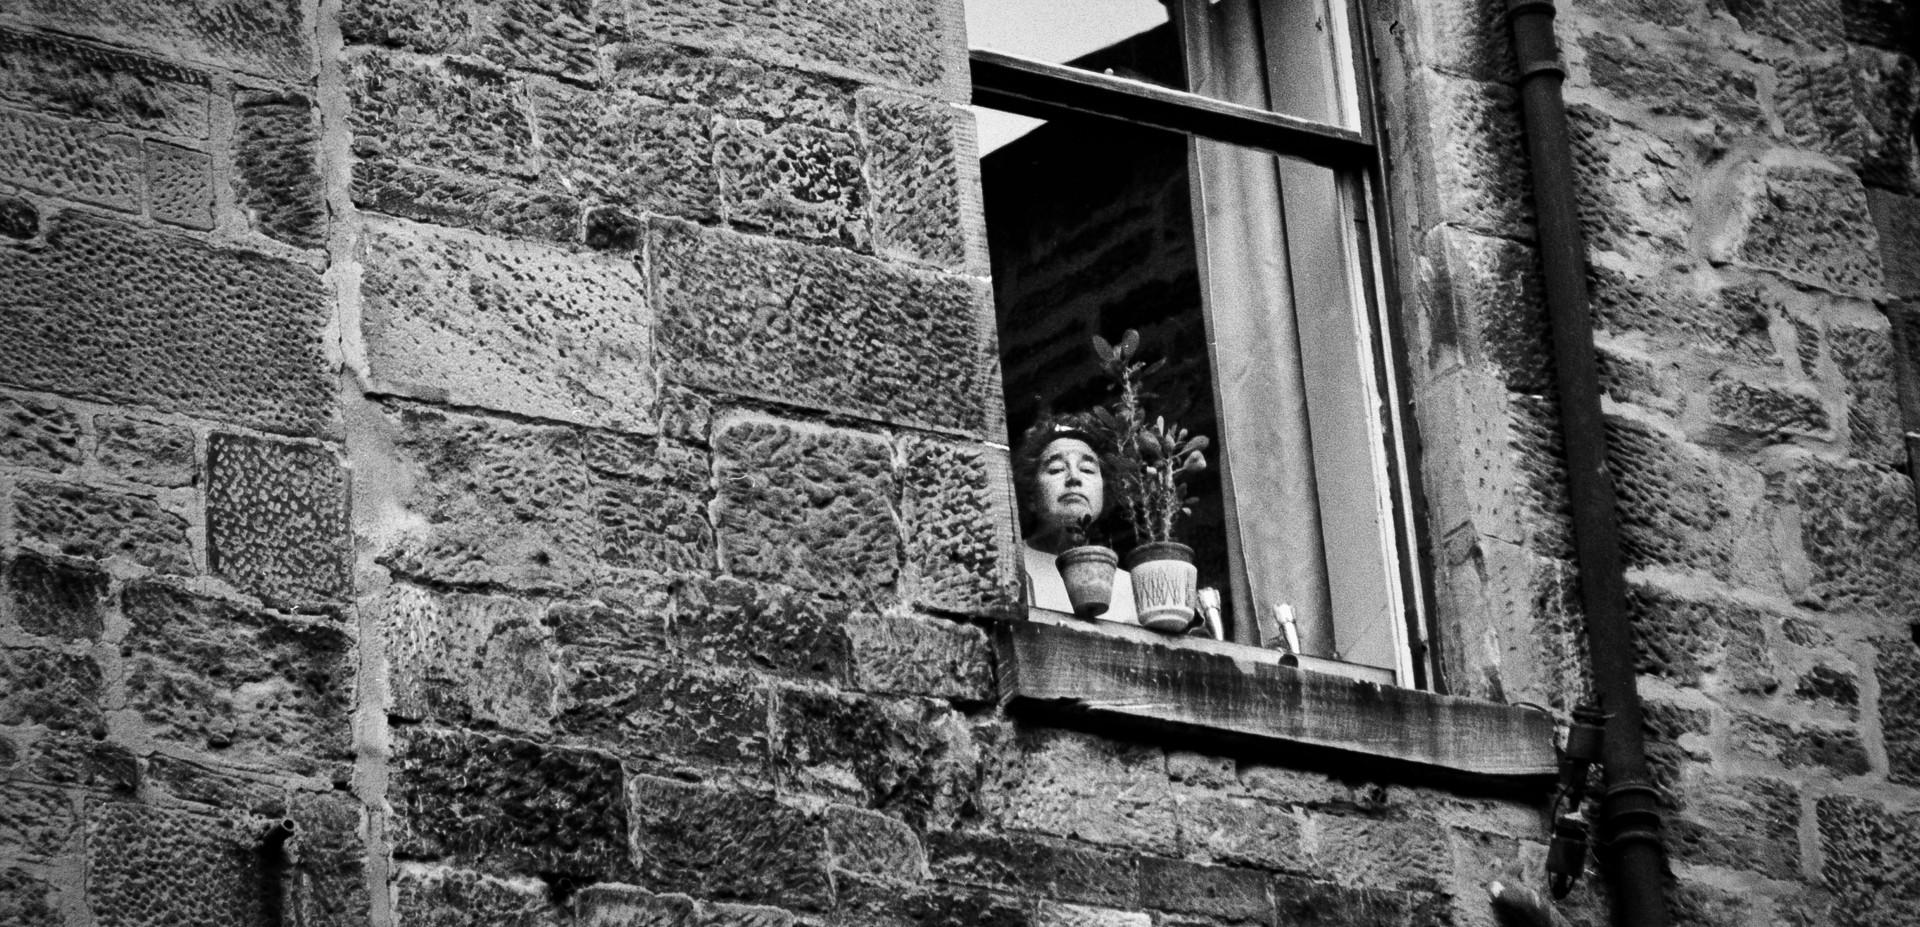 West End_Glasgow, Scotland 1976